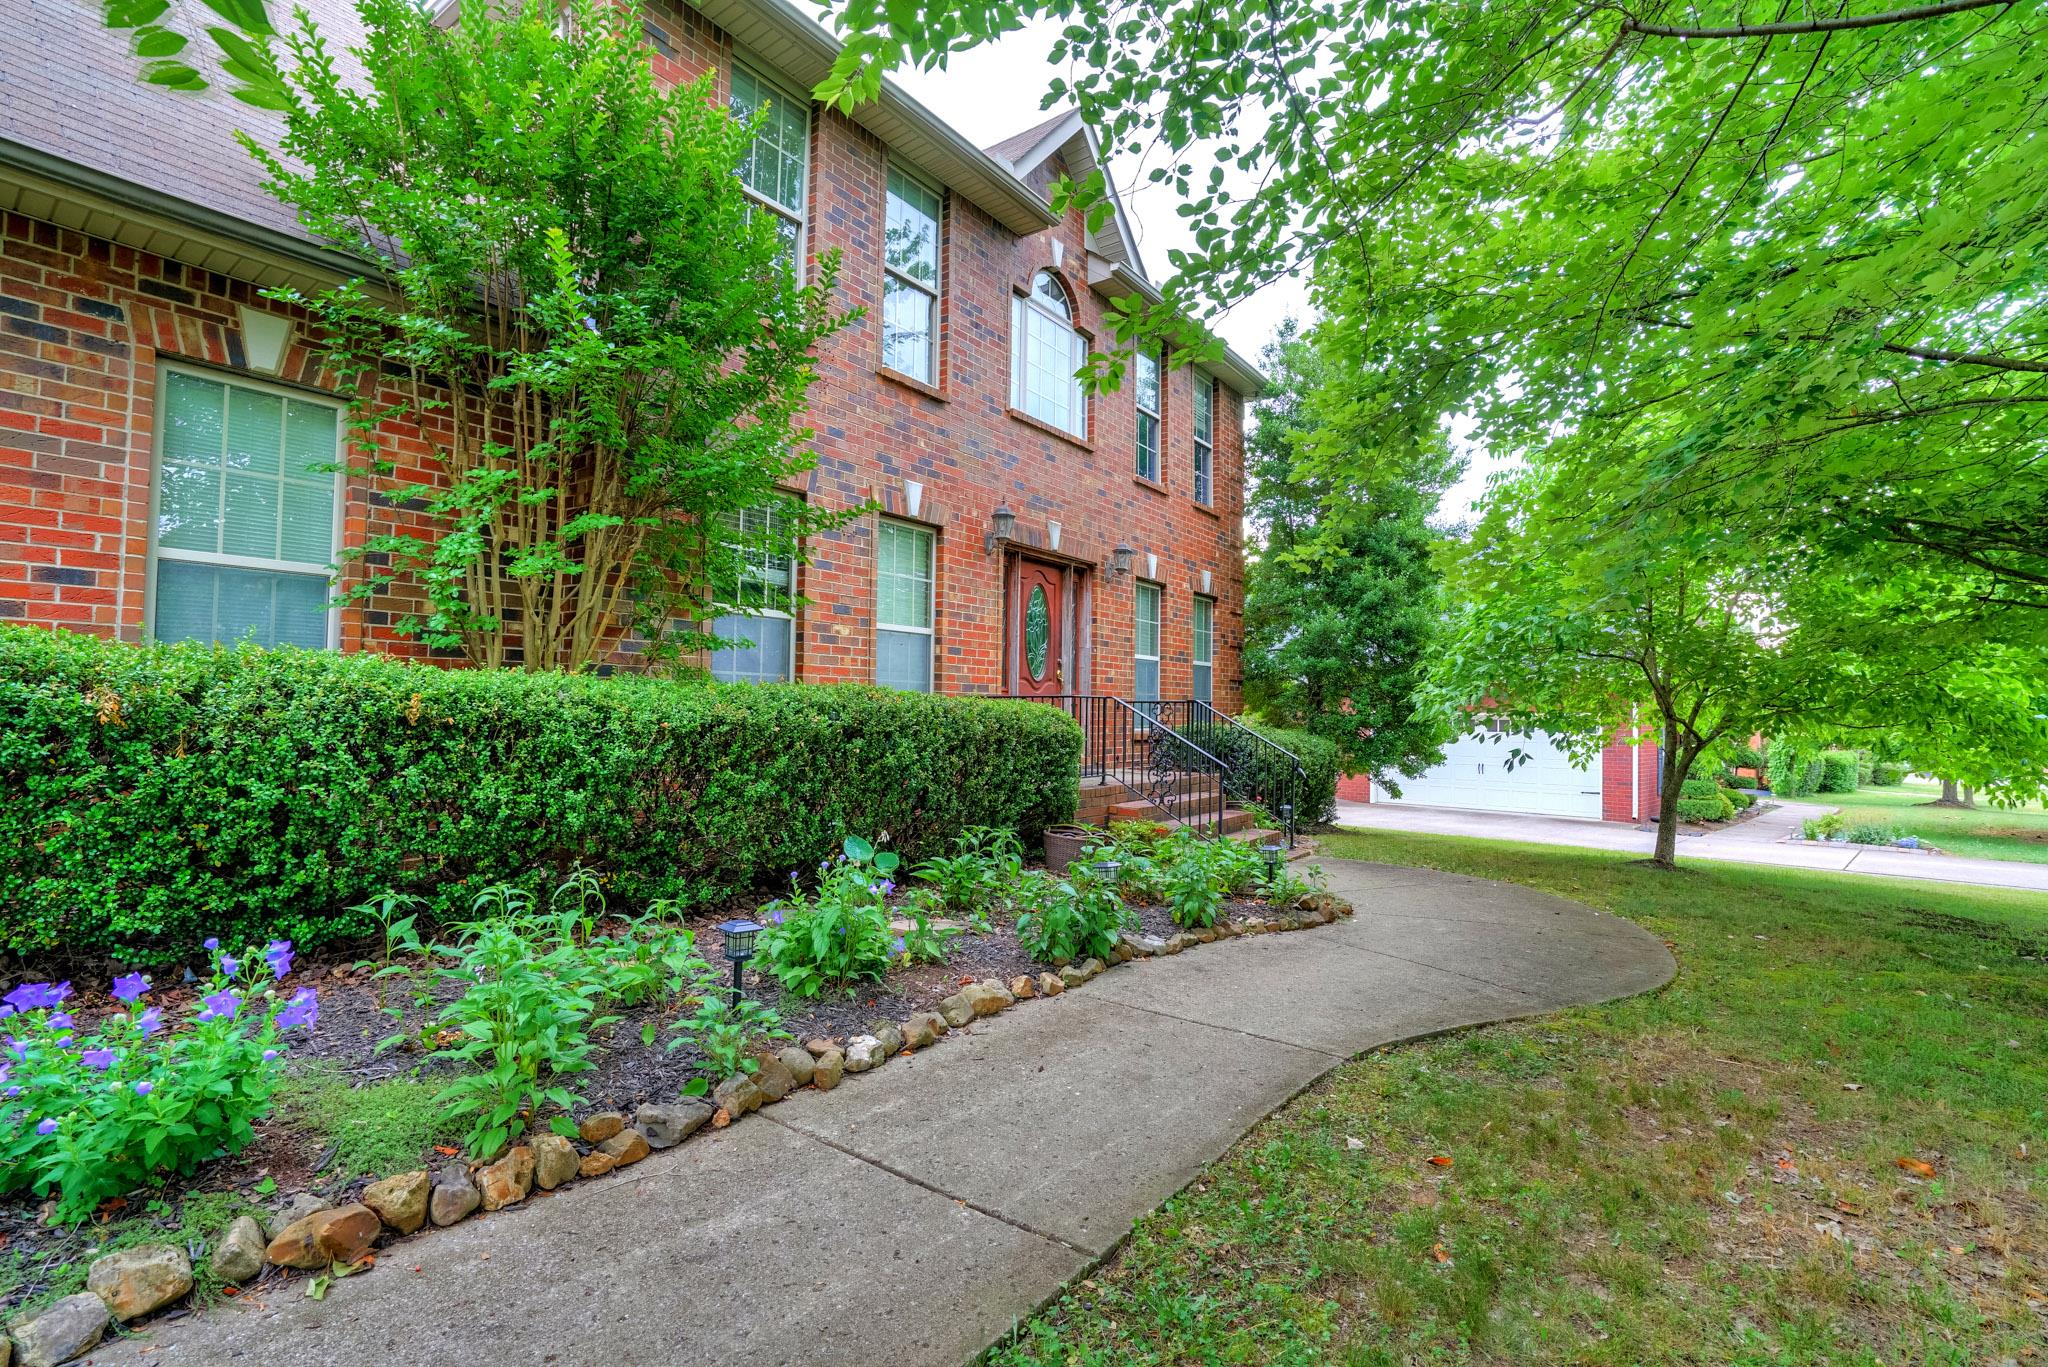 212 Comer Circle, Murfreesboro, TN 37128 - Murfreesboro, TN real estate listing